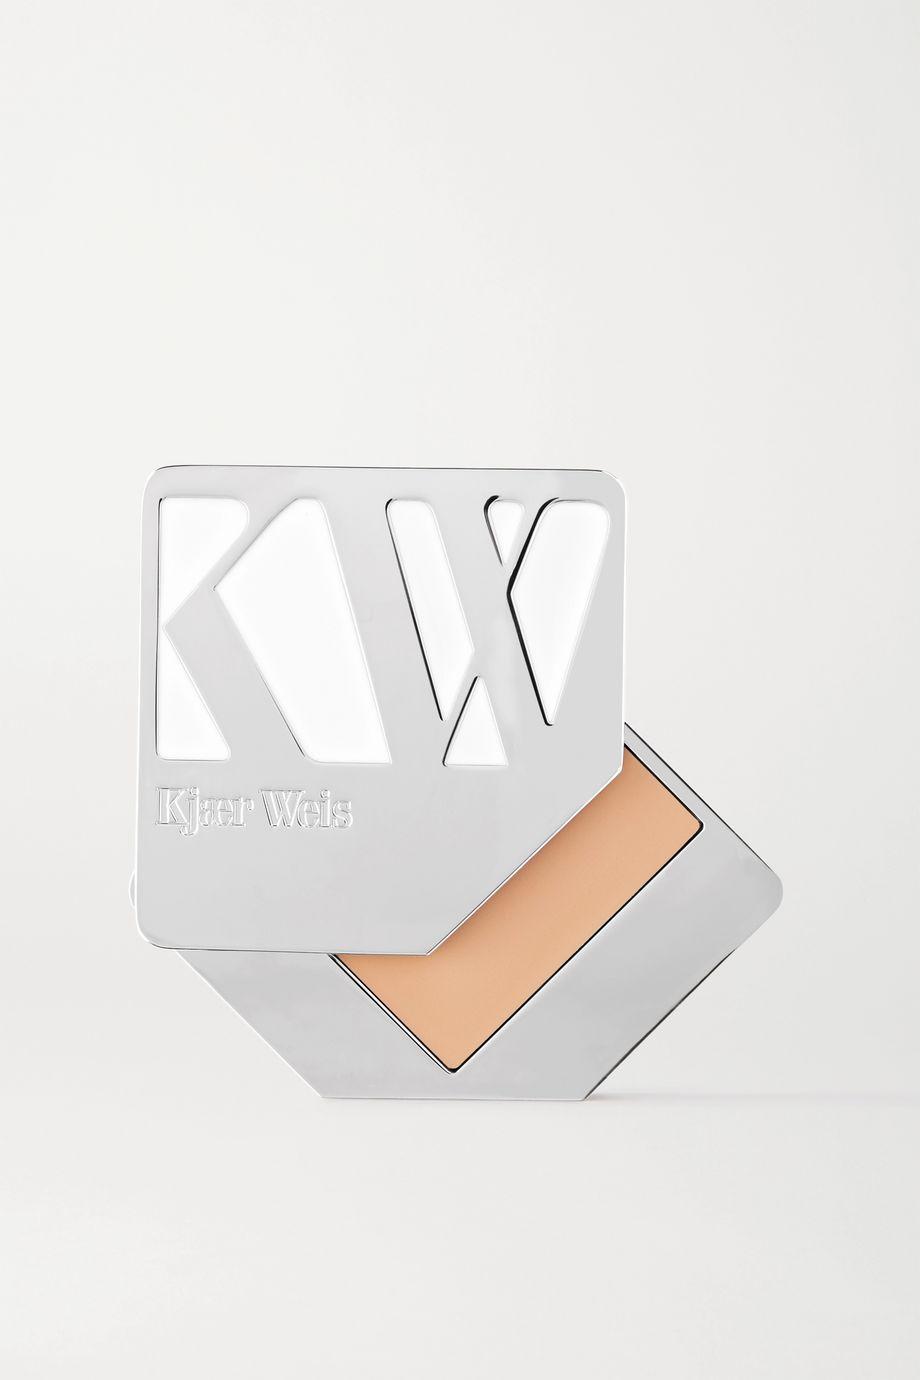 Kjaer Weis Cream Foundation - Feathery